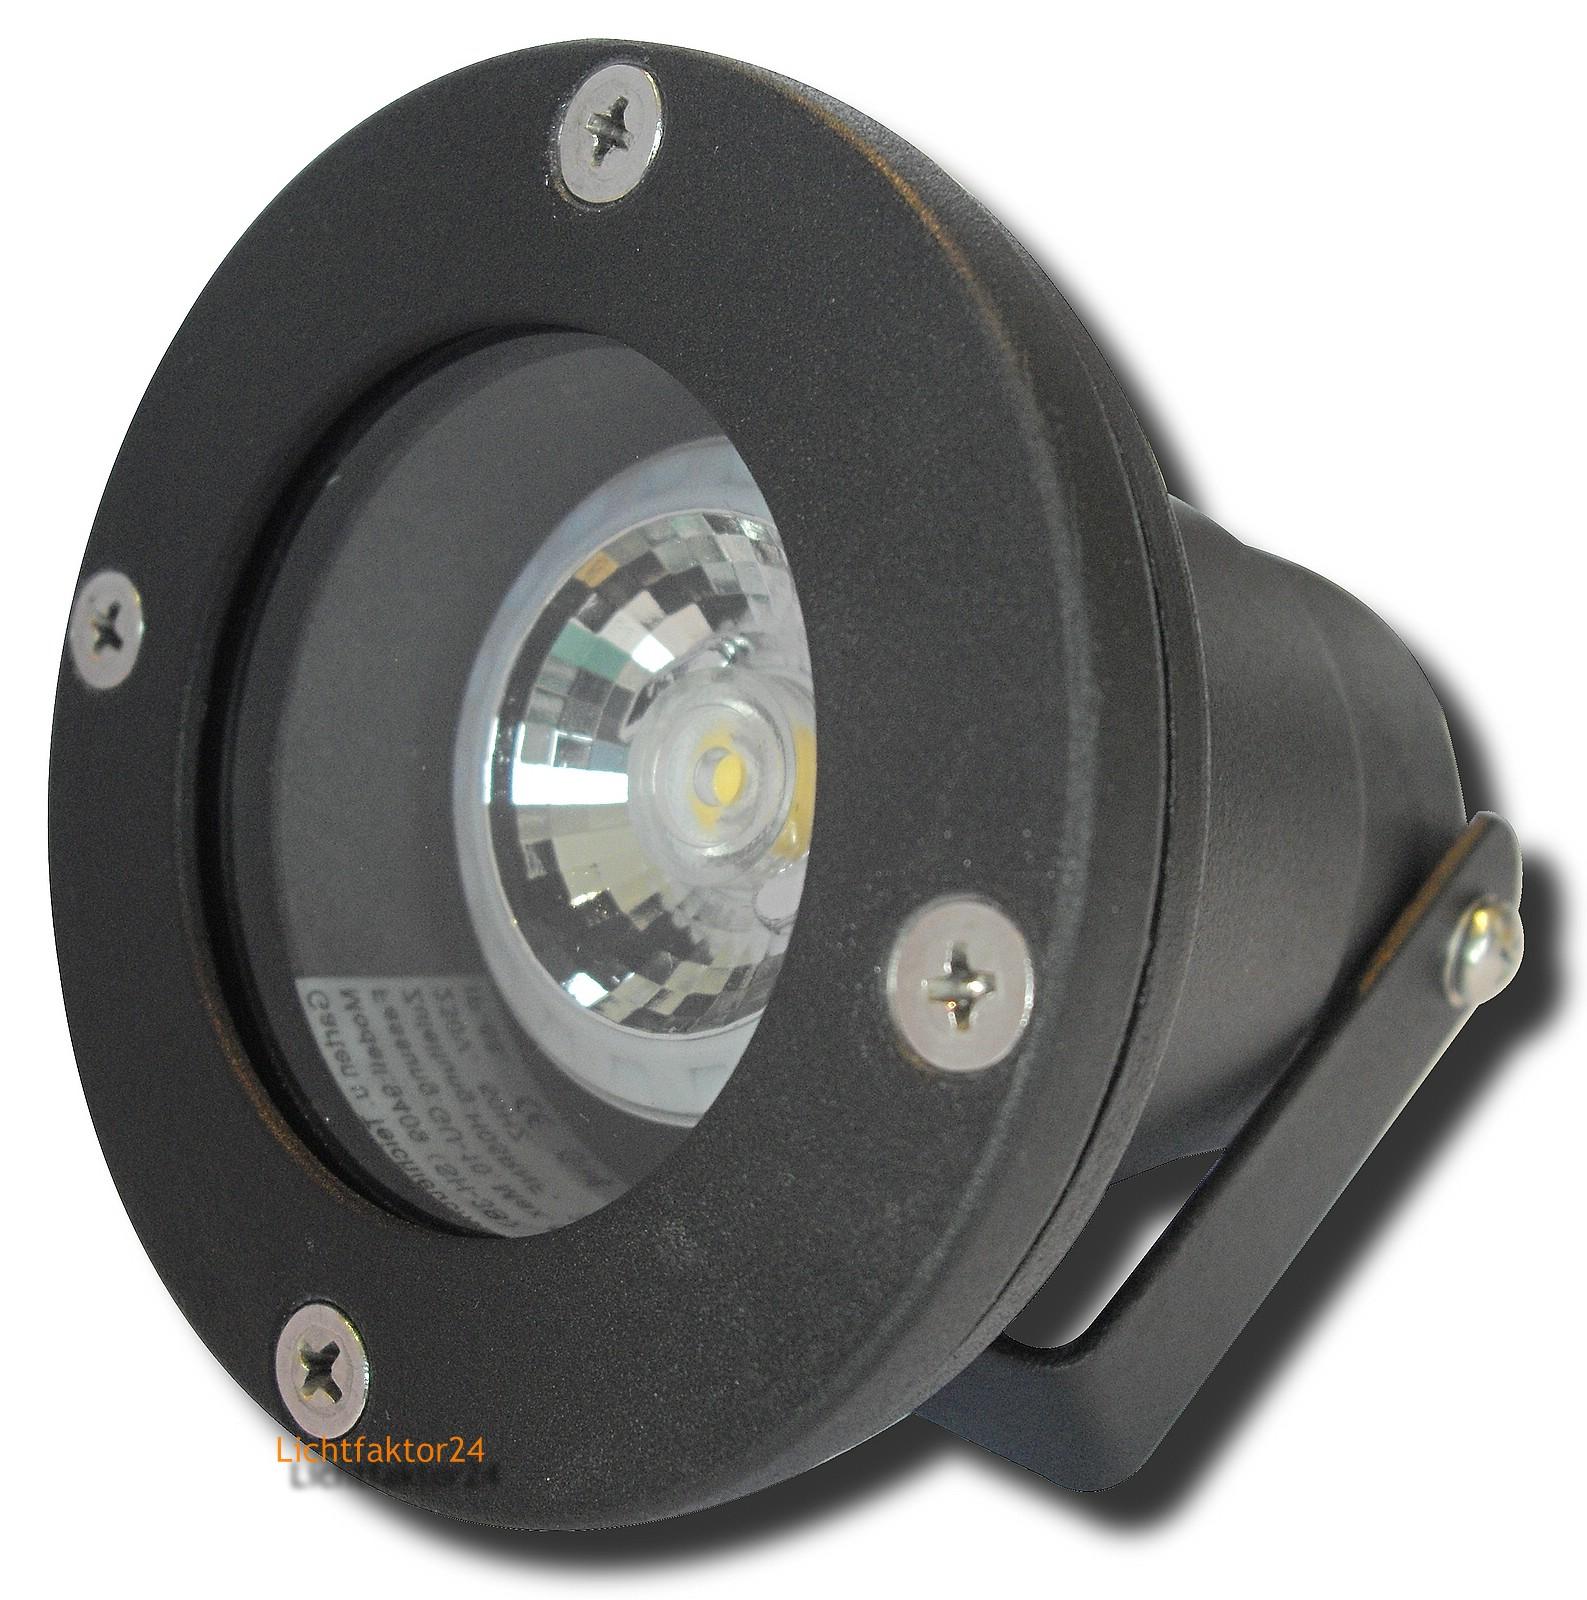 7w cob power led spotlampe dimmbar 230volt strahler zur teichbeleuchtung ip68 ebay. Black Bedroom Furniture Sets. Home Design Ideas